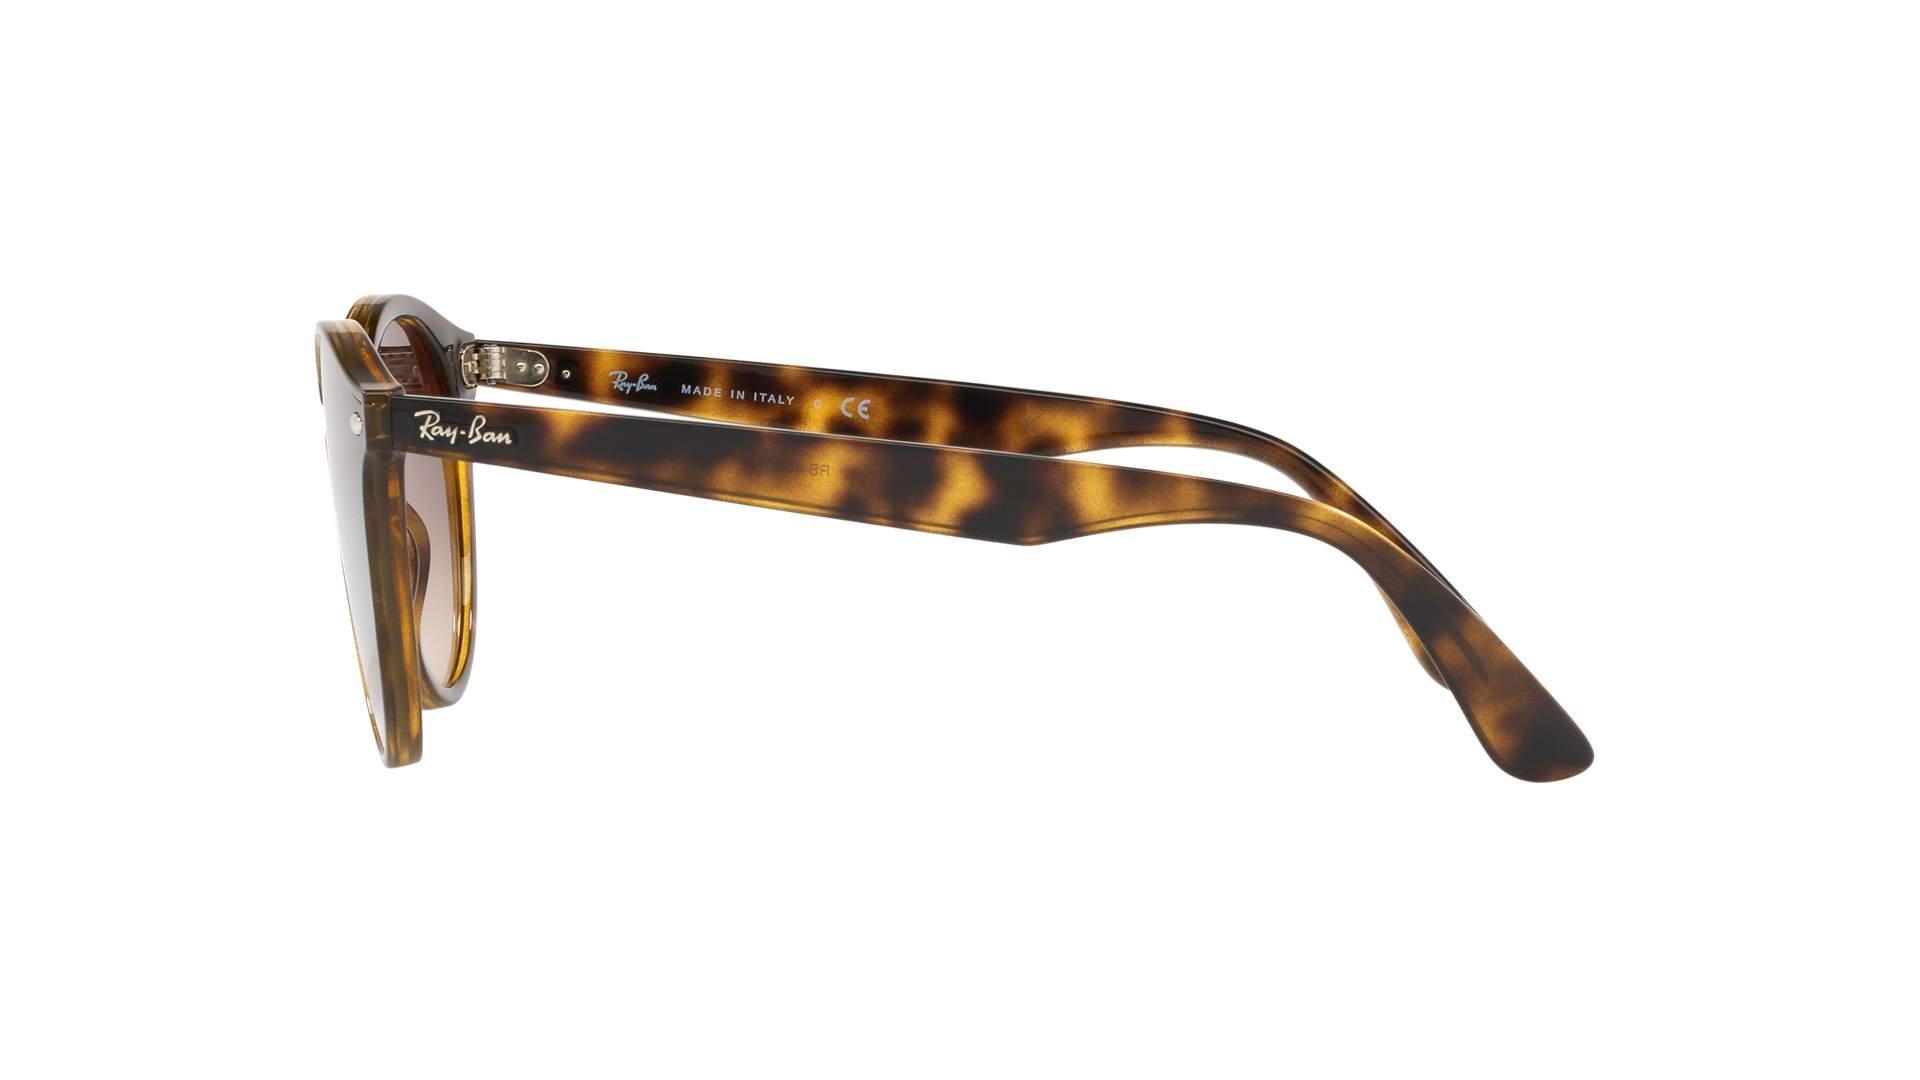 ed66152b4ffec Sunglasses Ray-Ban Blaze RB4380N 710 13 37-17 Brown Matte Medium Gradient